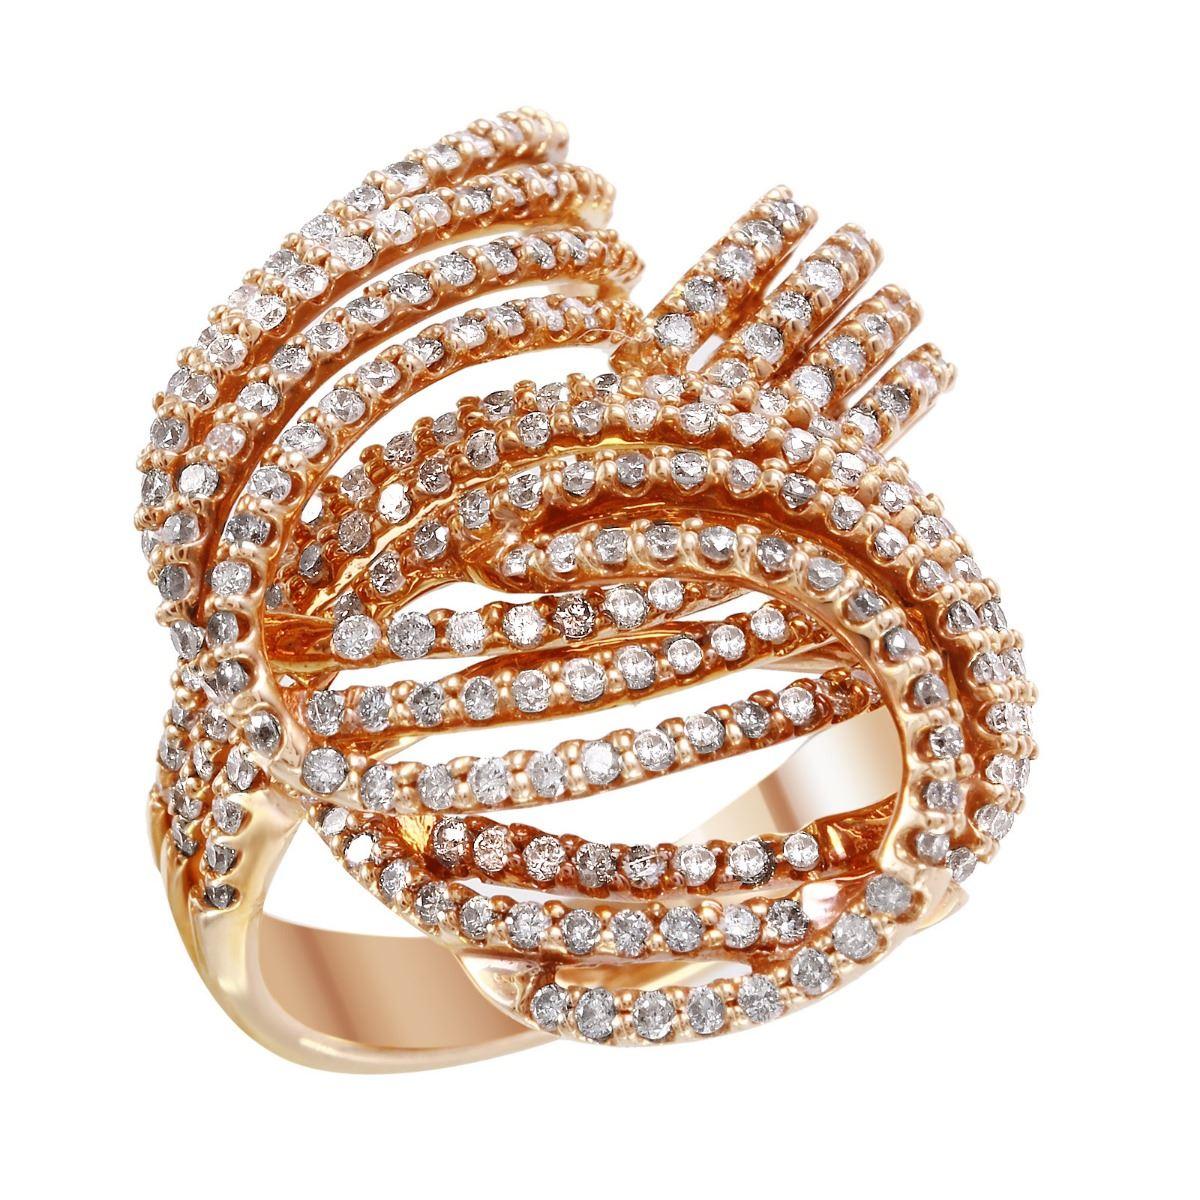 NEW 14KT Rose Gold Diamond Knot Ring - #1995